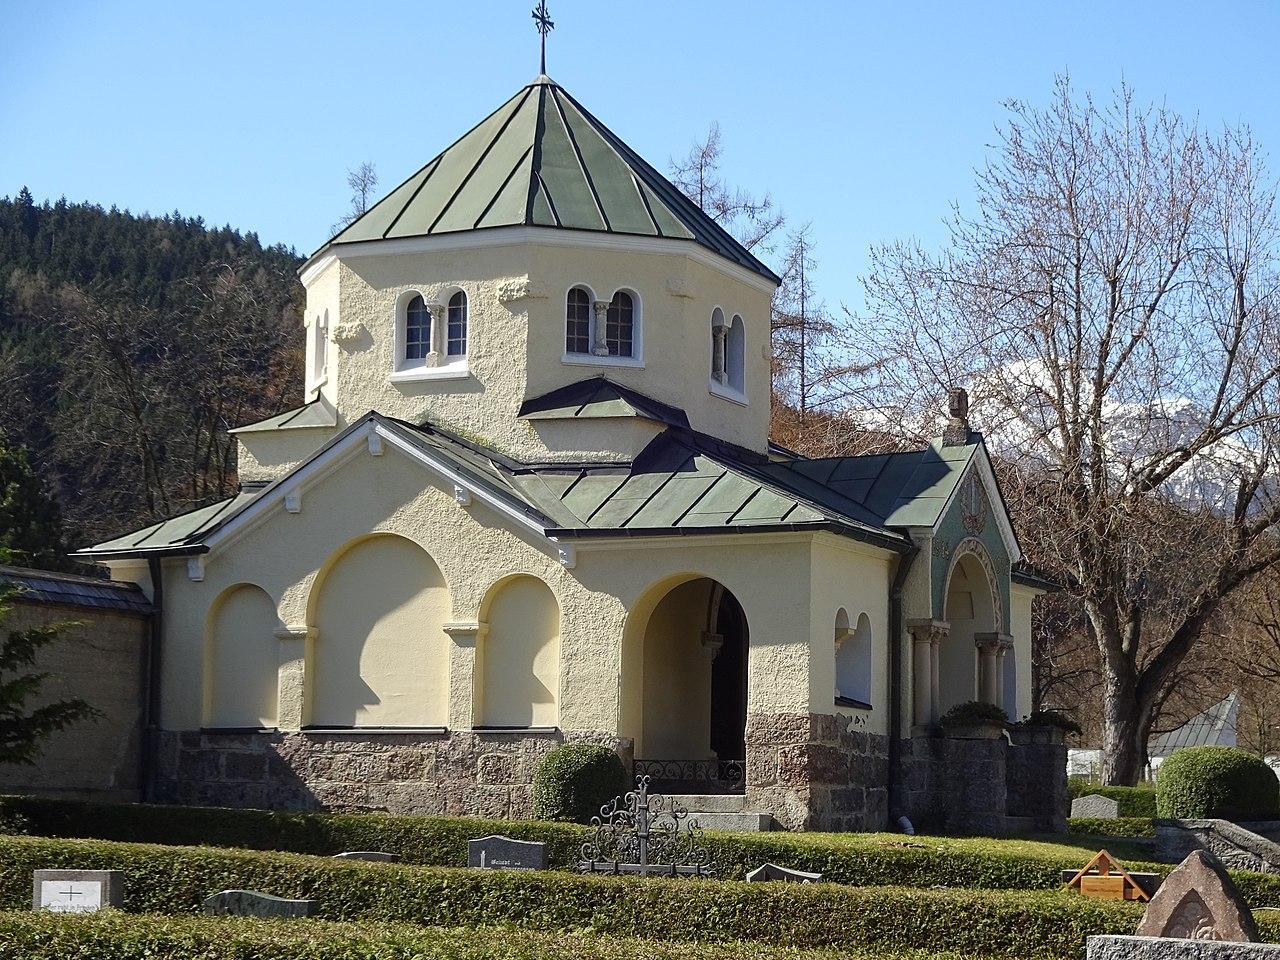 Eastern Cemetery (Innsbruck, Austria)